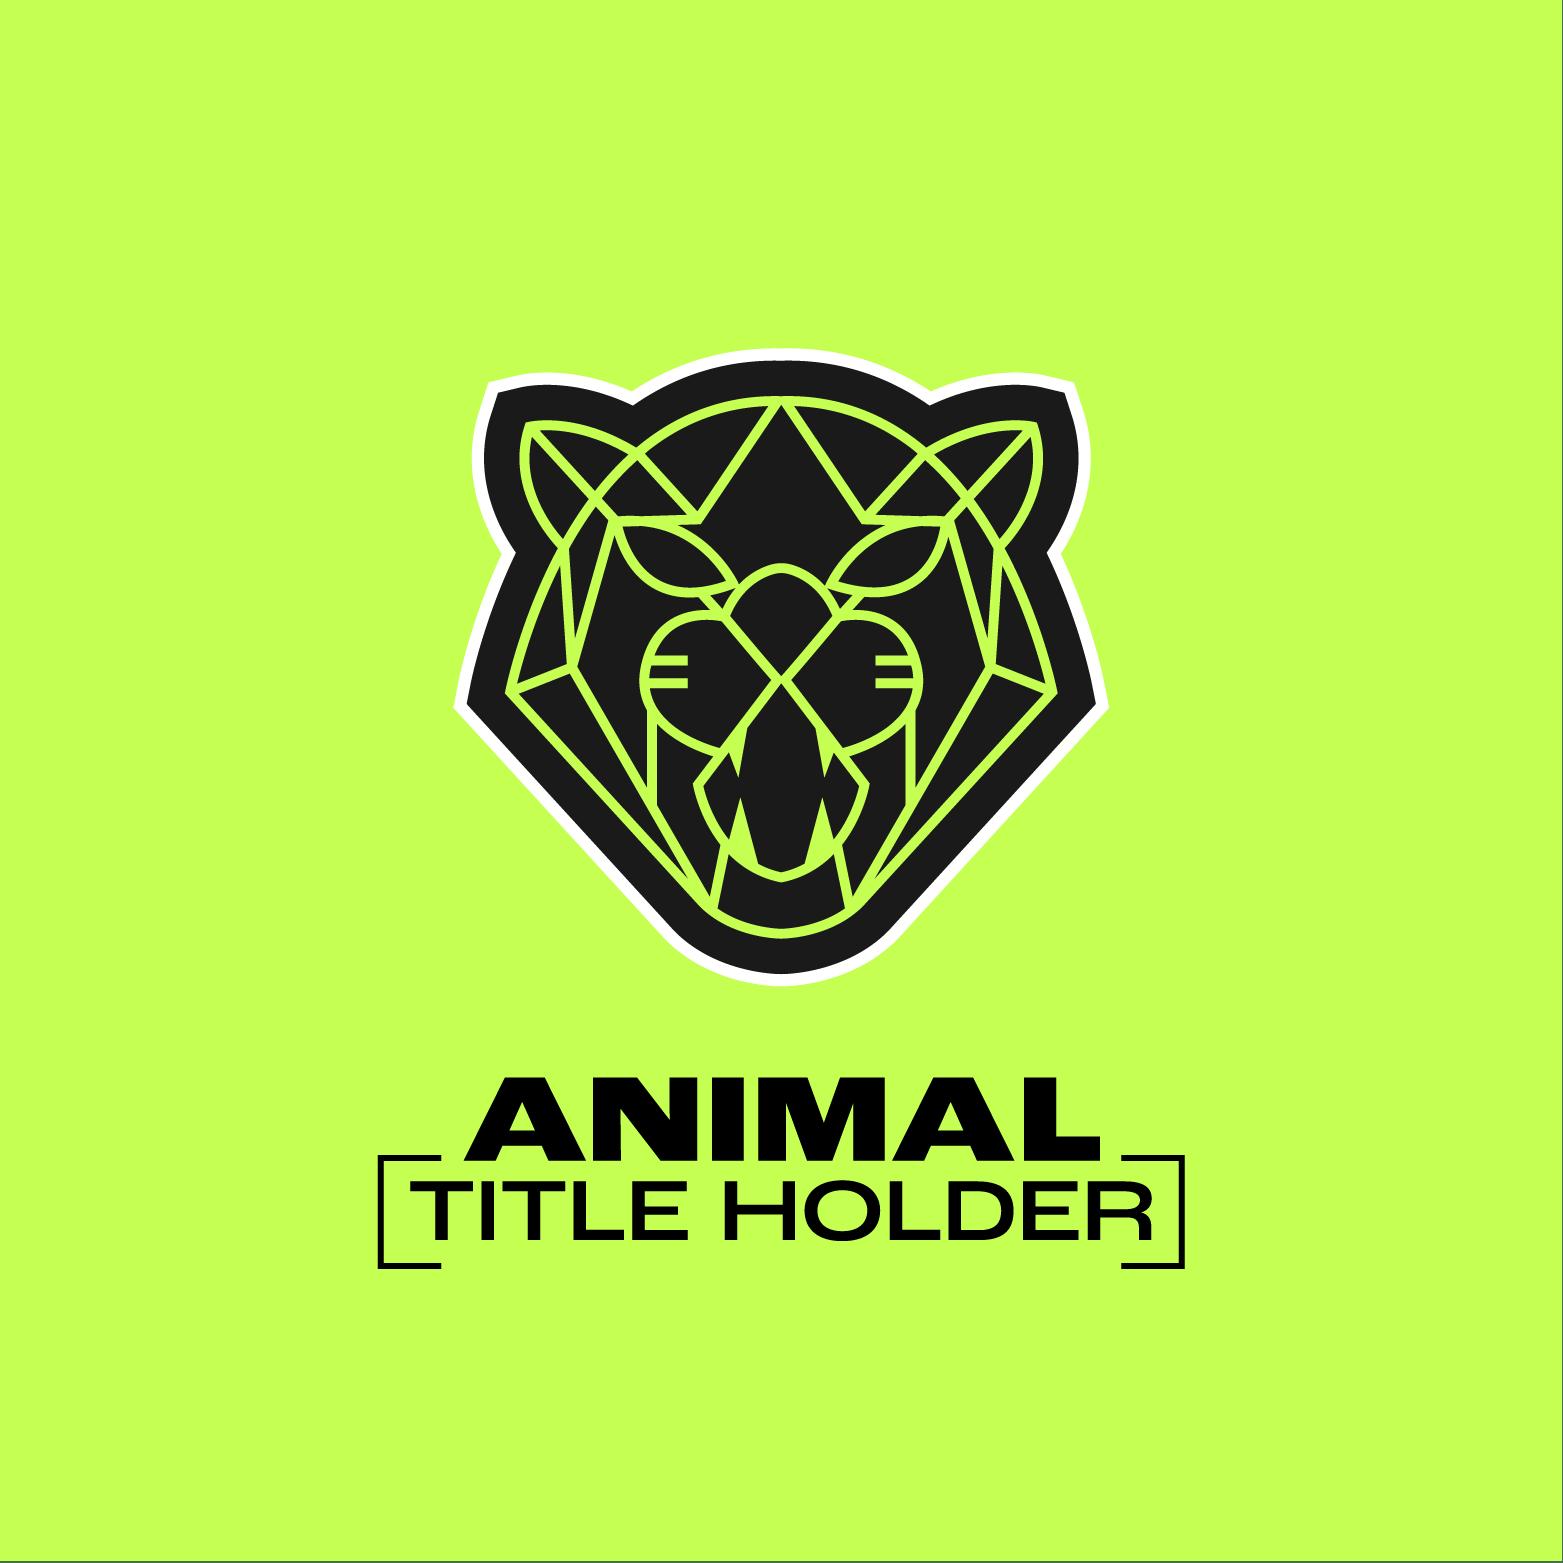 "Black logo on ne on solid lime green background; Black text below image reads ""Title holder, Animal"""